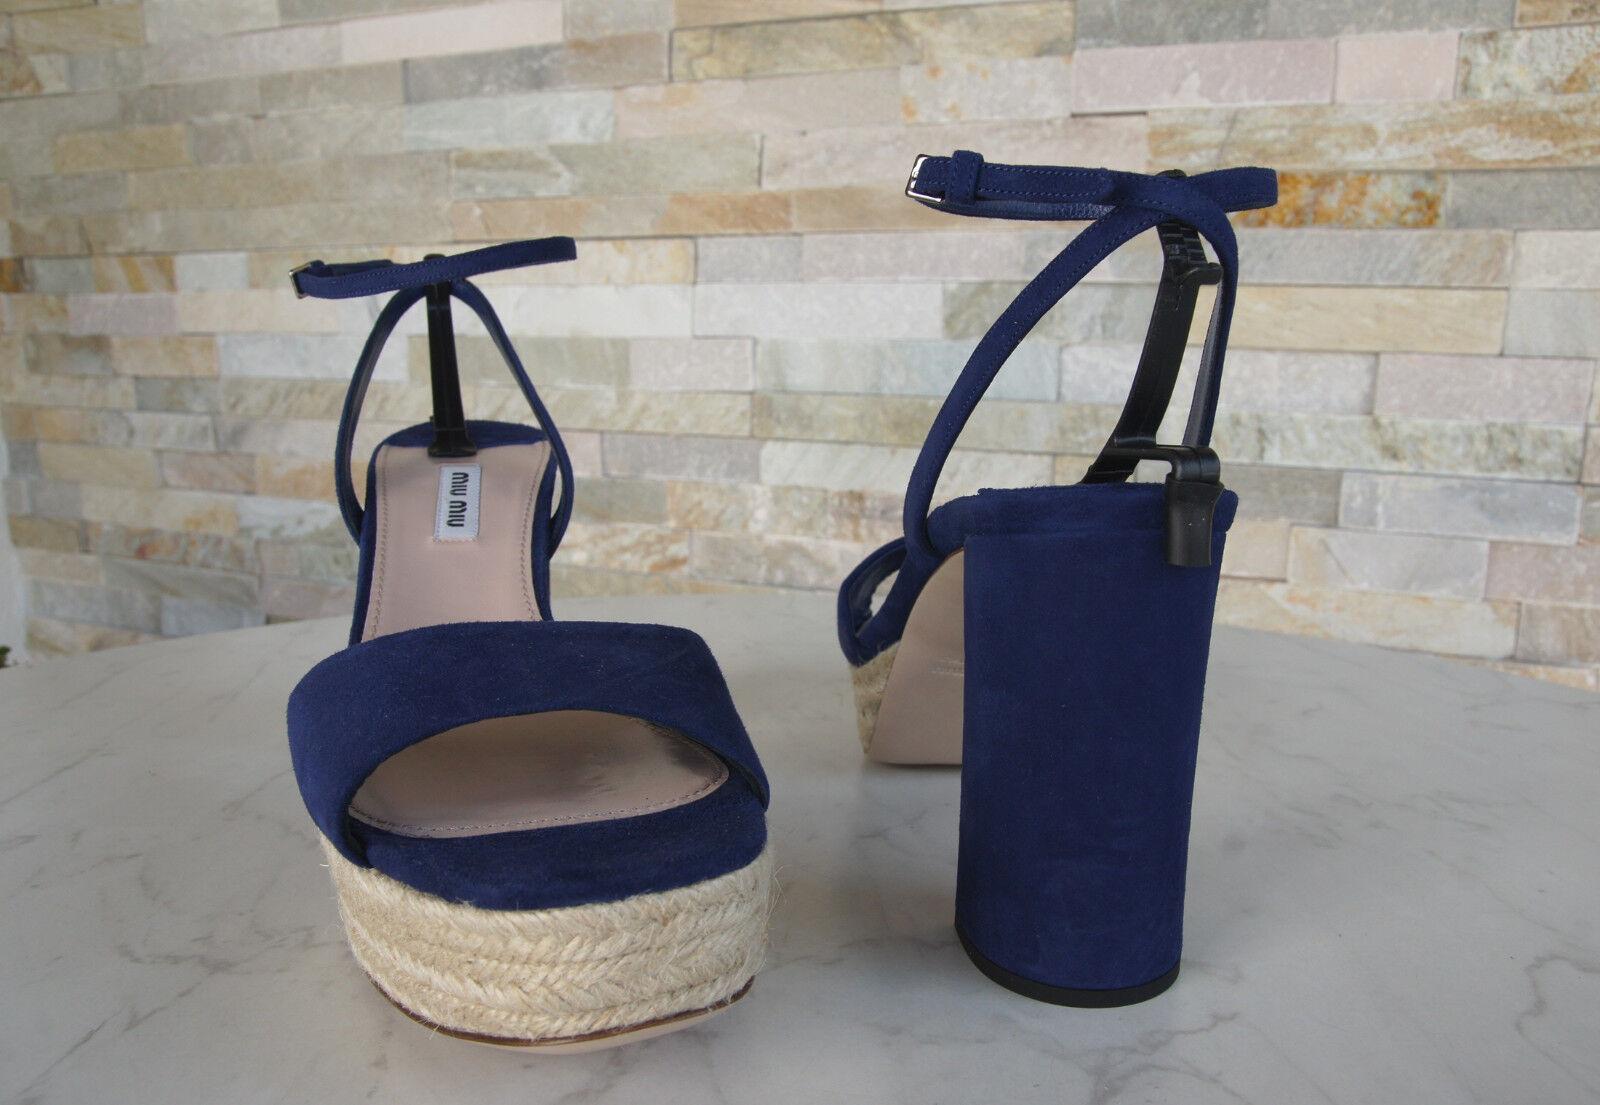 MIU CANAPA Miu taglia 41 Plateau Sandali Sandals Scarpe CANAPA MIU BLU NAVY NUOVO UVP 117aca